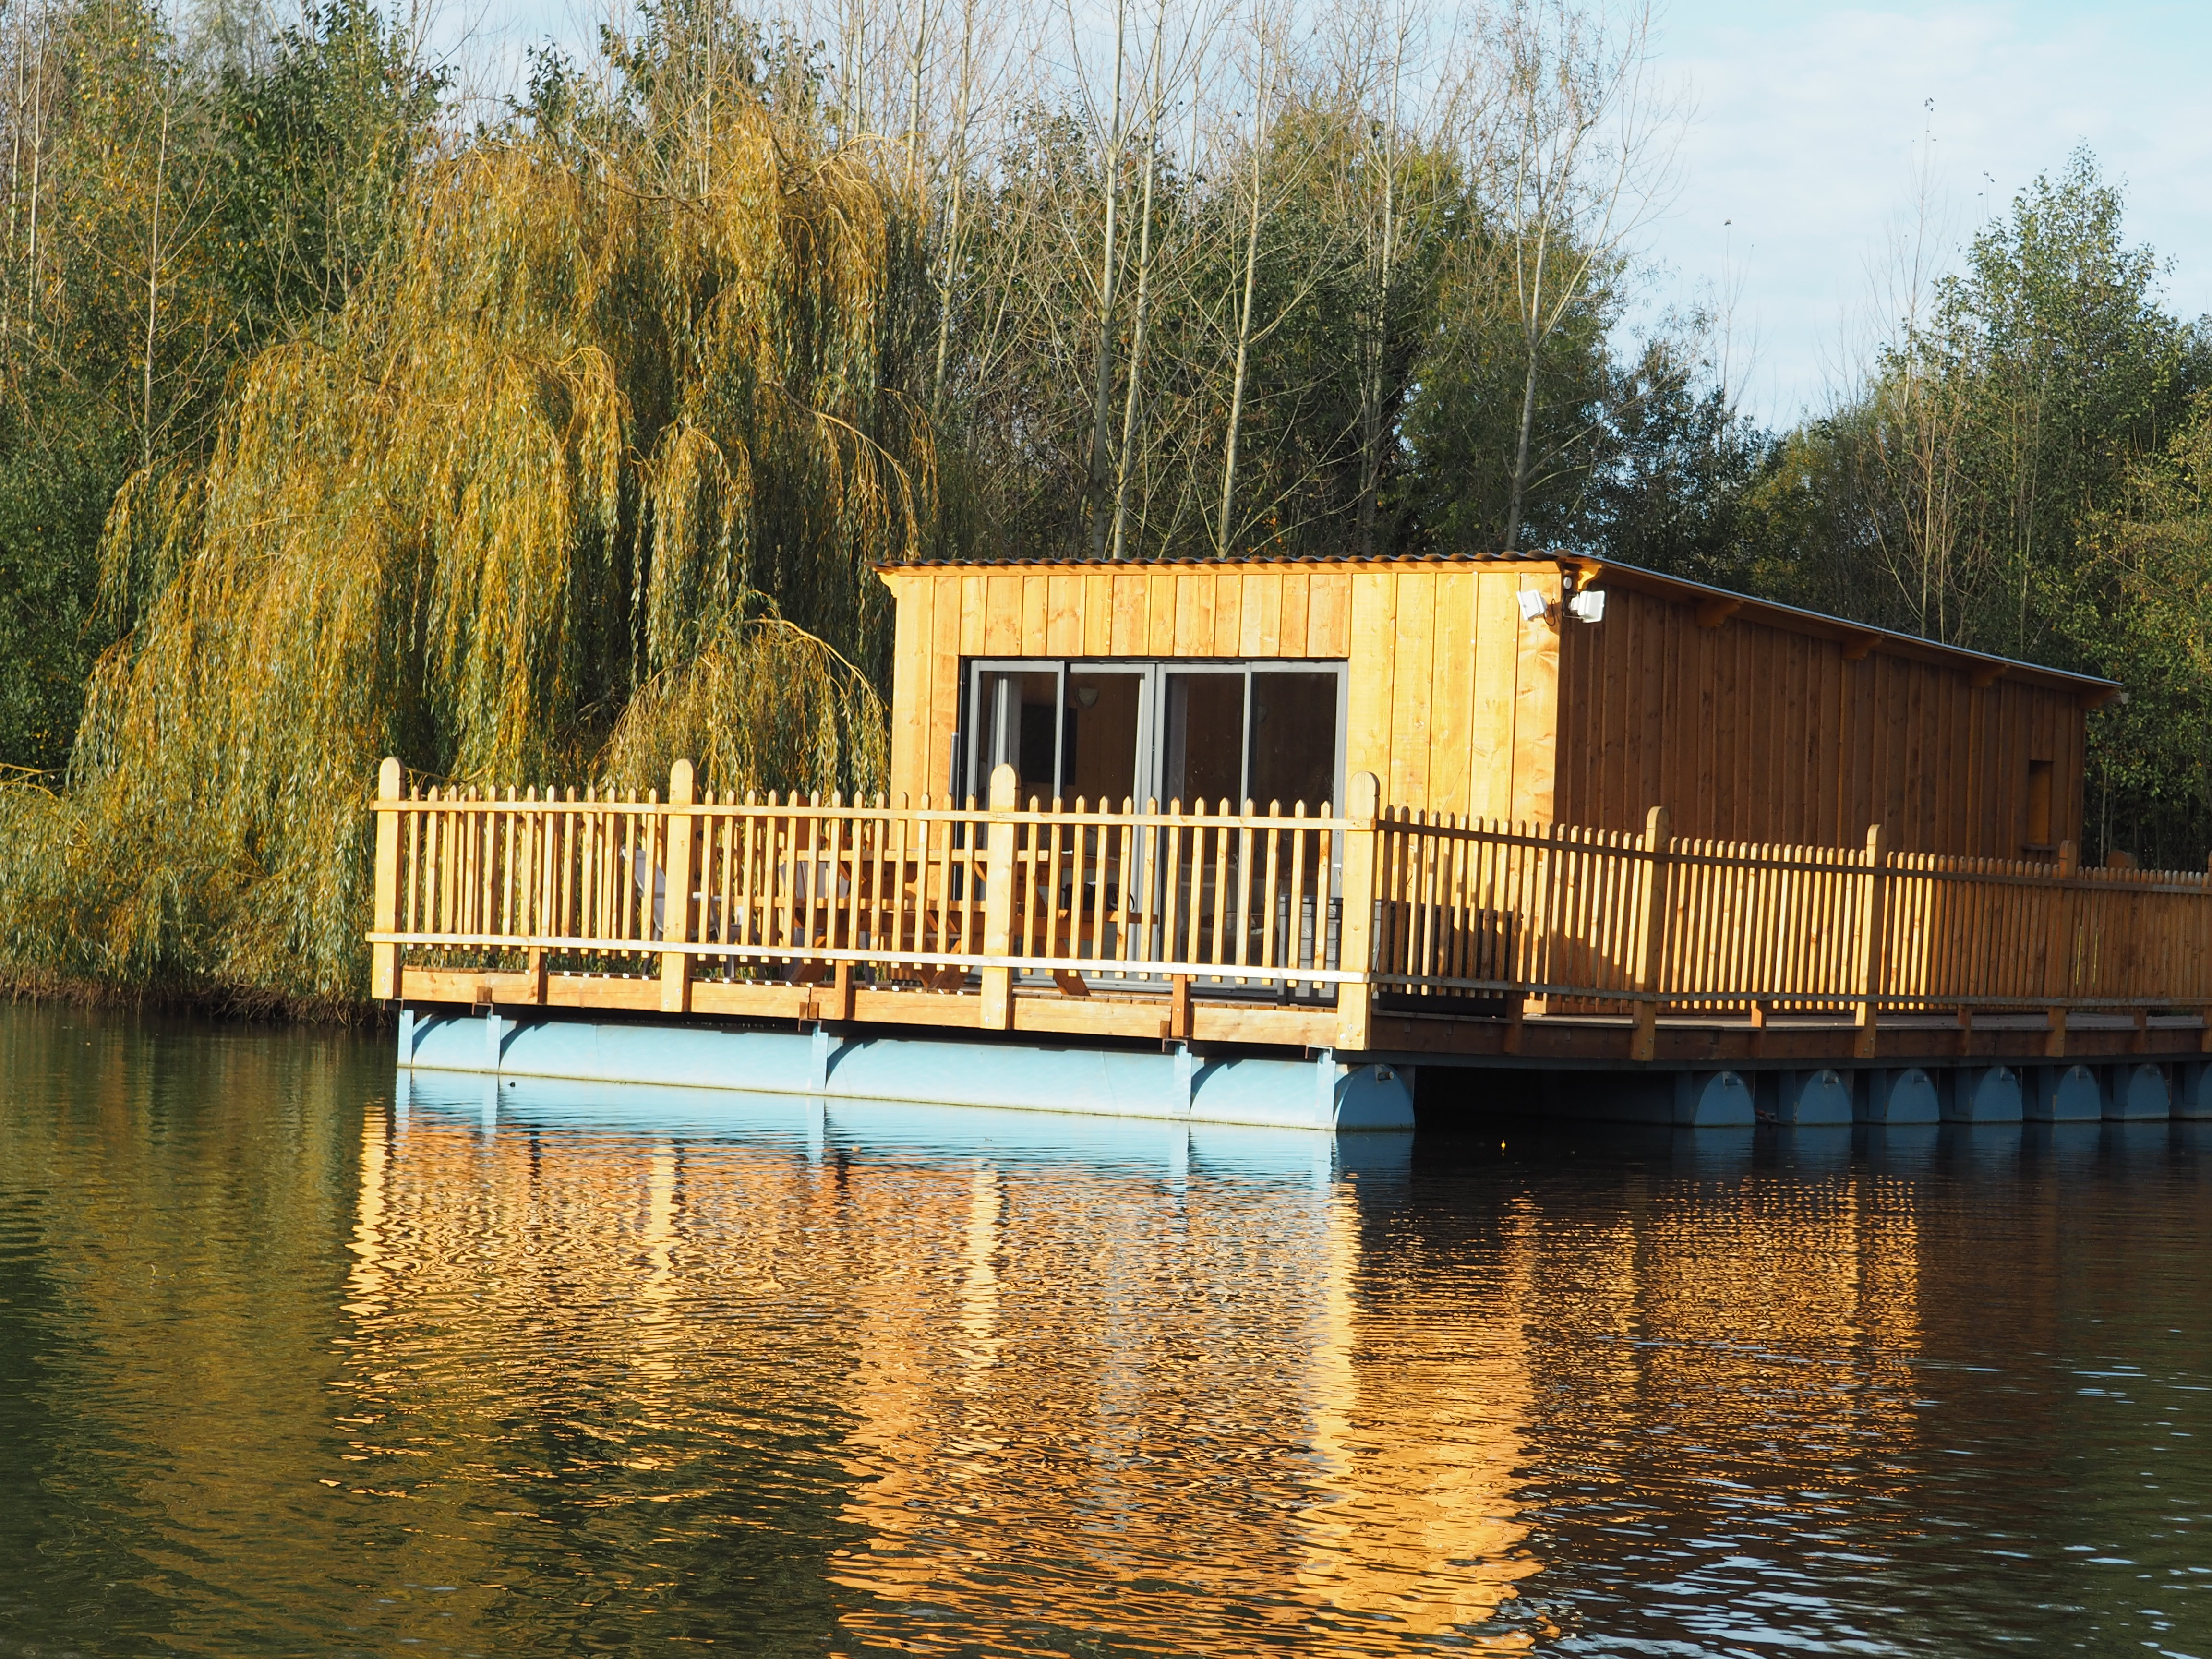 notre cabane sur l 39 eau malice et blabla. Black Bedroom Furniture Sets. Home Design Ideas